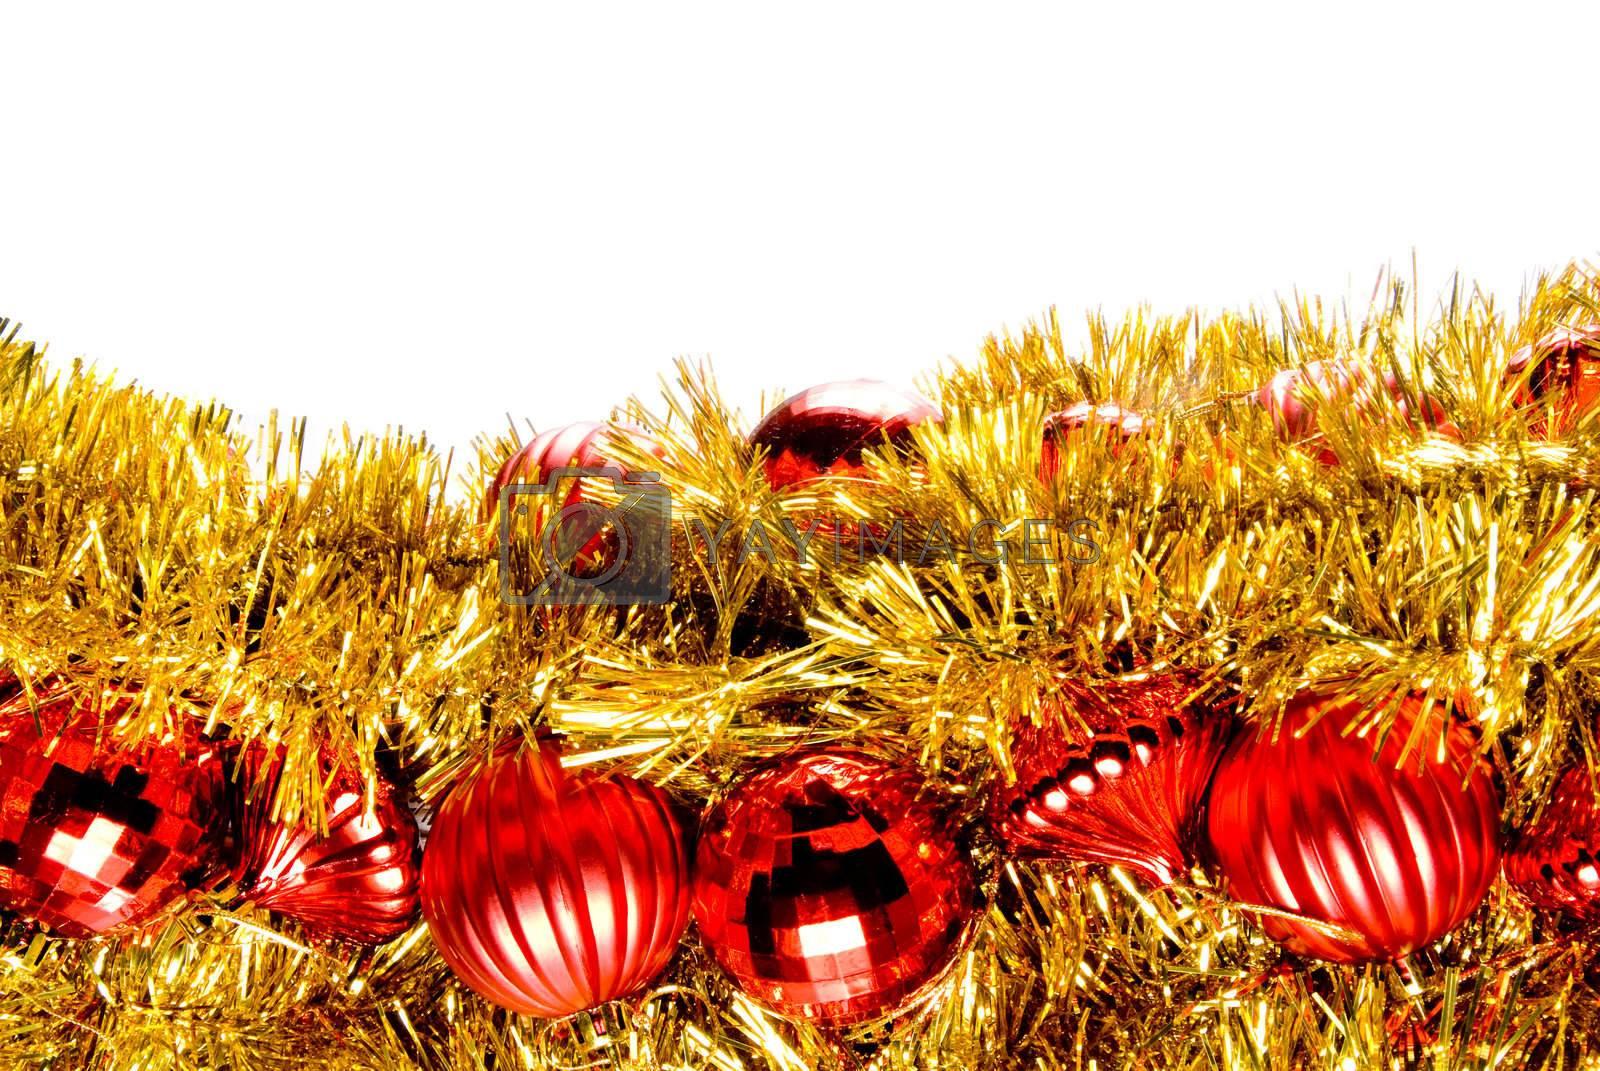 Seasonal ornaments used during the Christmas season.